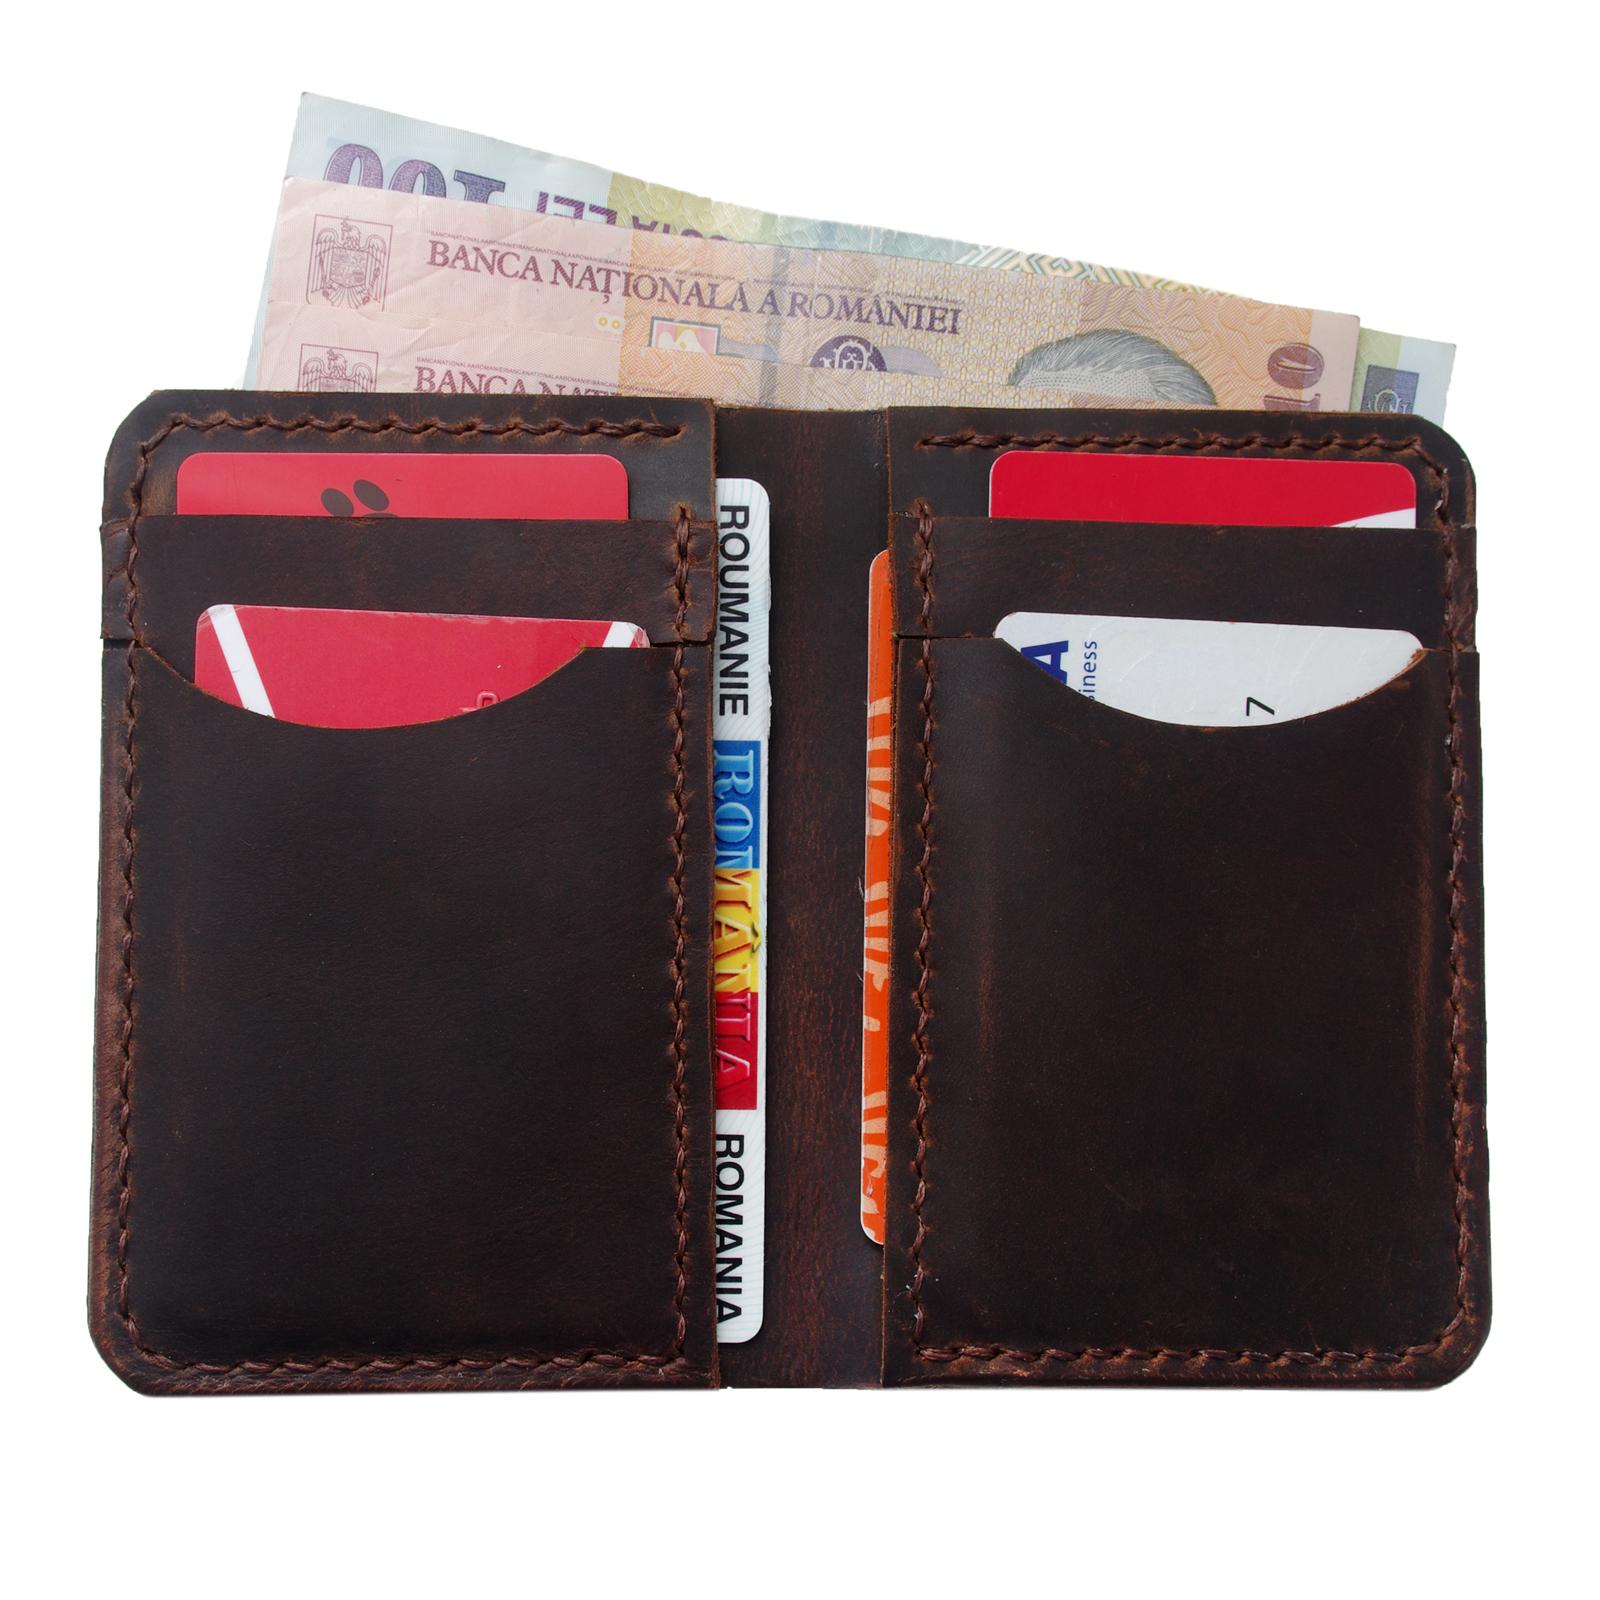 portofel-barbatesc-din-piele-naturala-buletin-carduri-model-M4-4